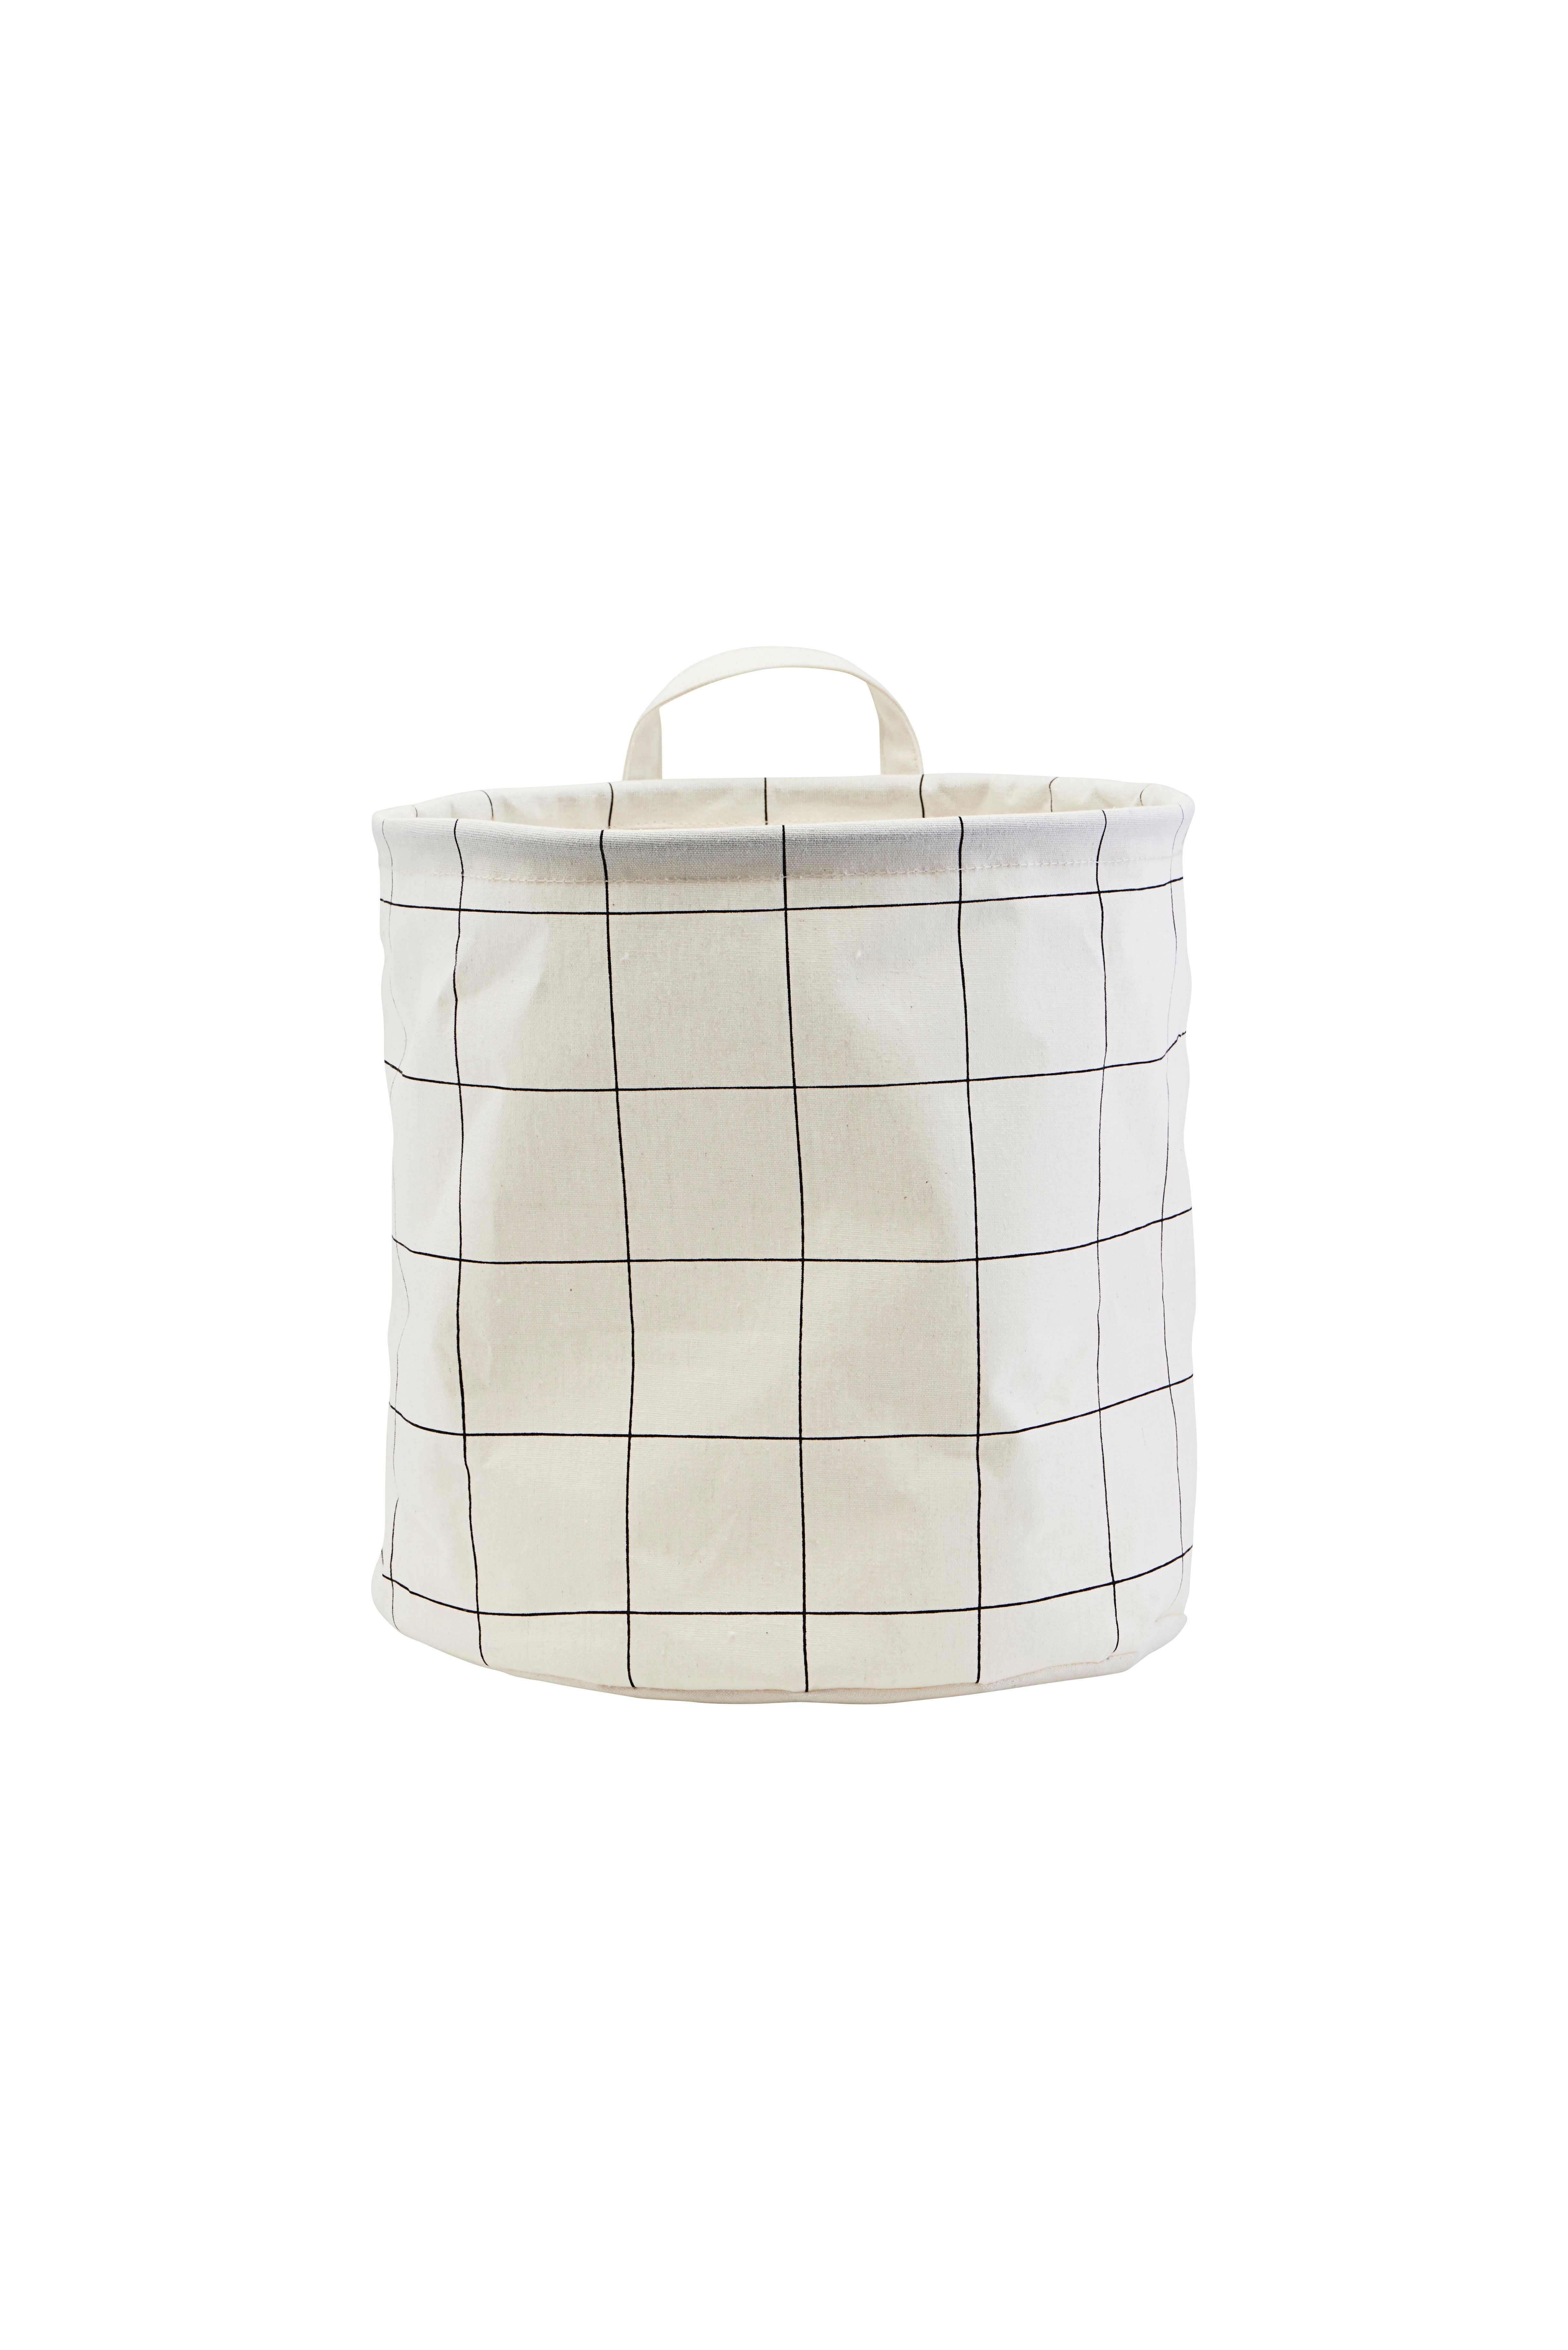 House Doctor - Storage Bag Squares Medium - White (LS0351)